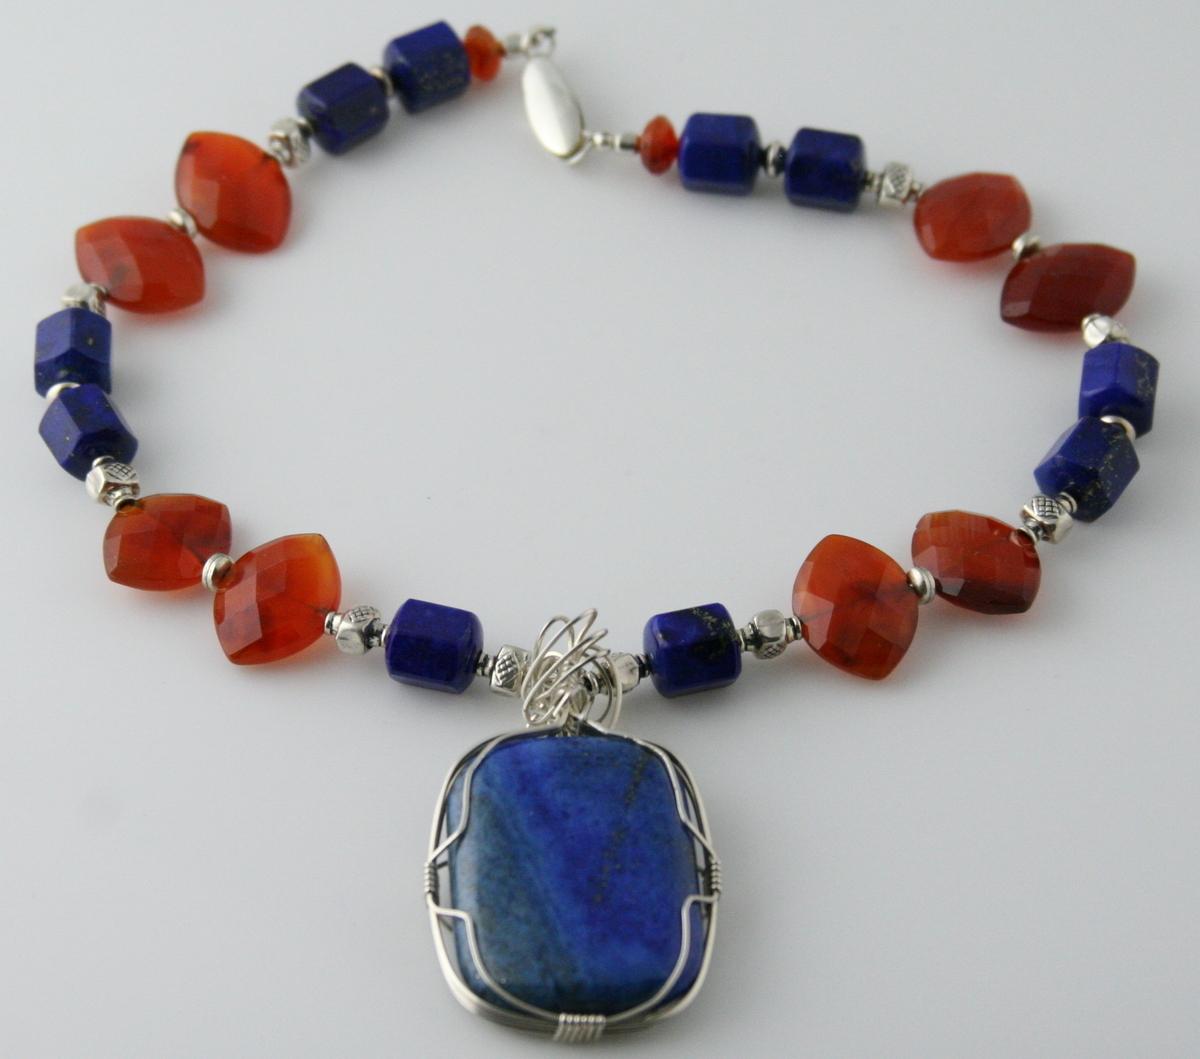 Blue Lapis & Orange Carnelian Pendant Necklace - AZMIDISKE (large view)